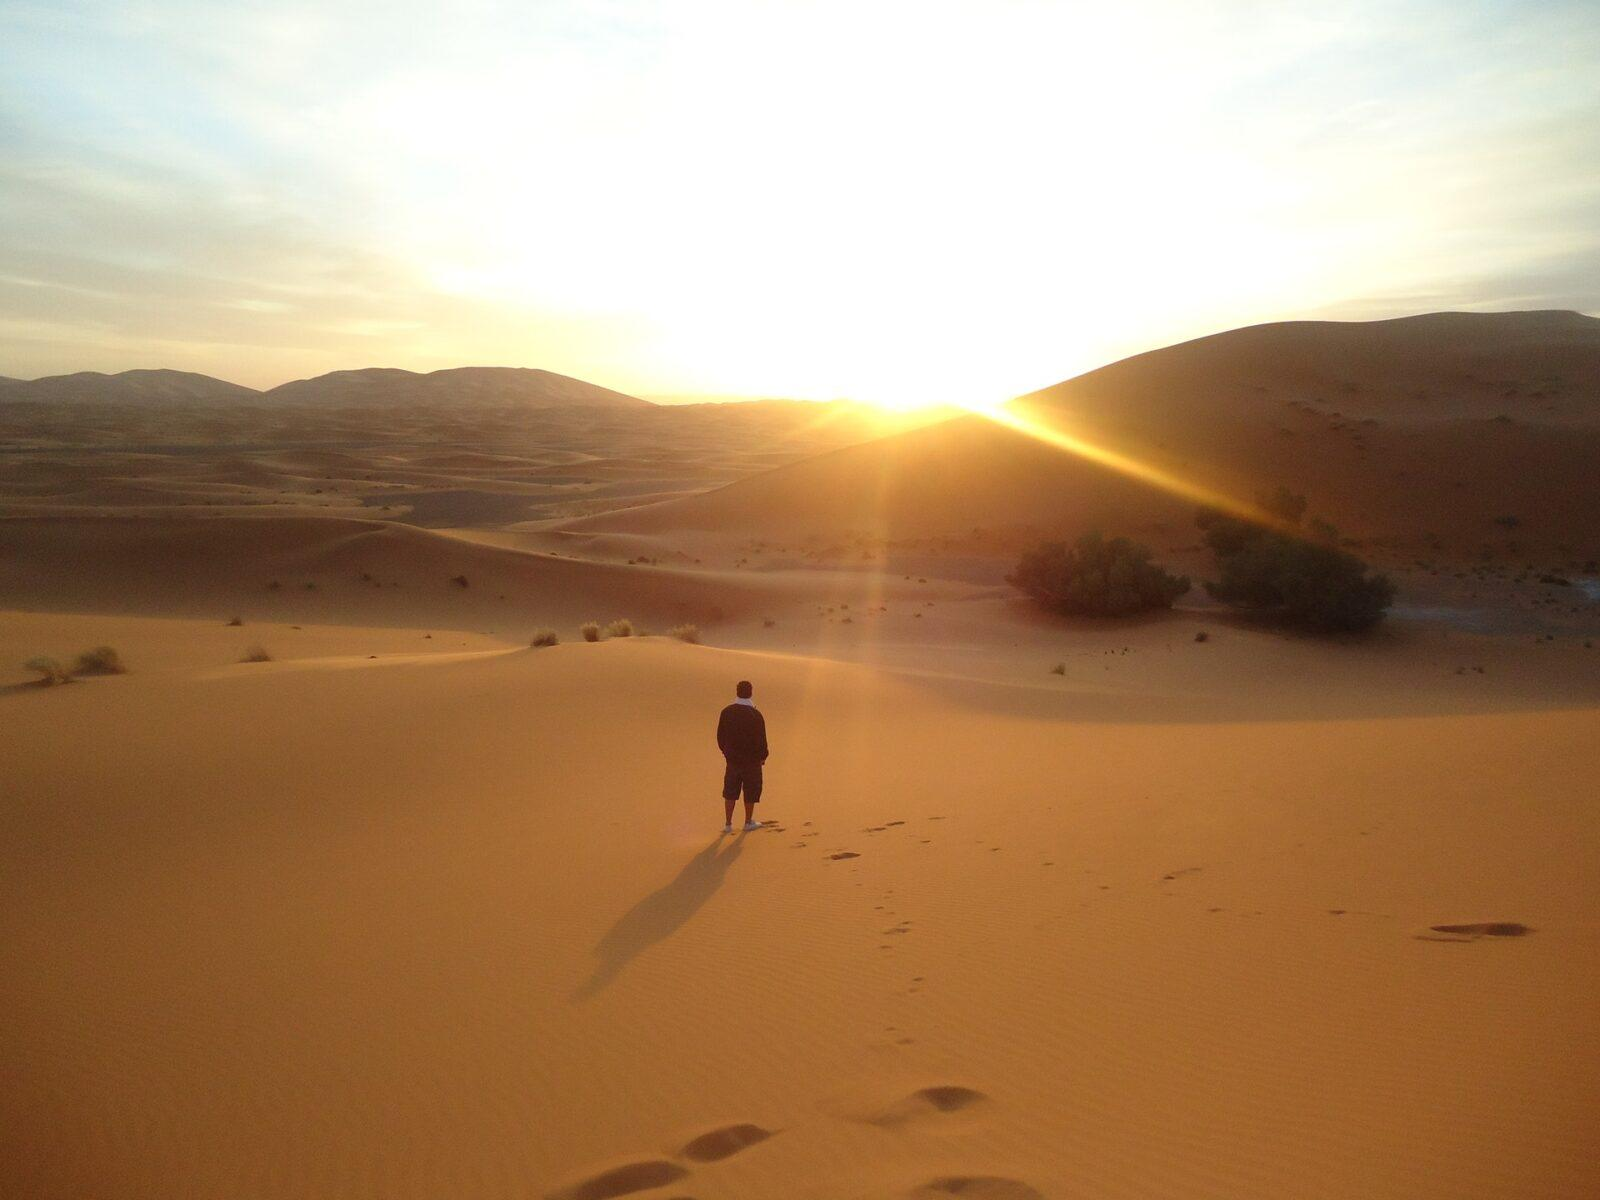 pexels faical zaramod 774835 1536x1152 - Guide Morocco Tours